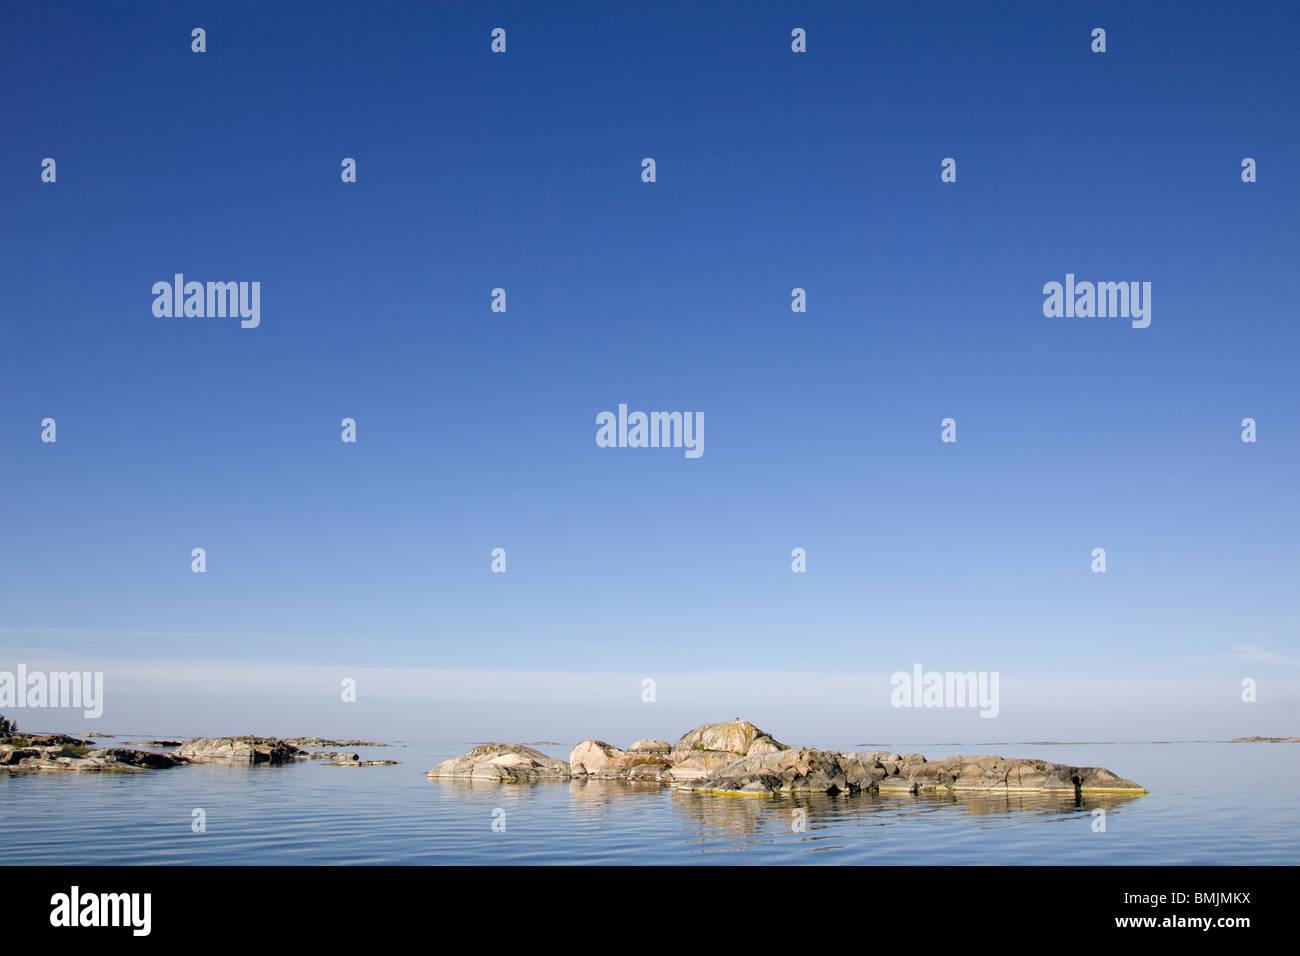 Flat rock in the ocean - Stock Image